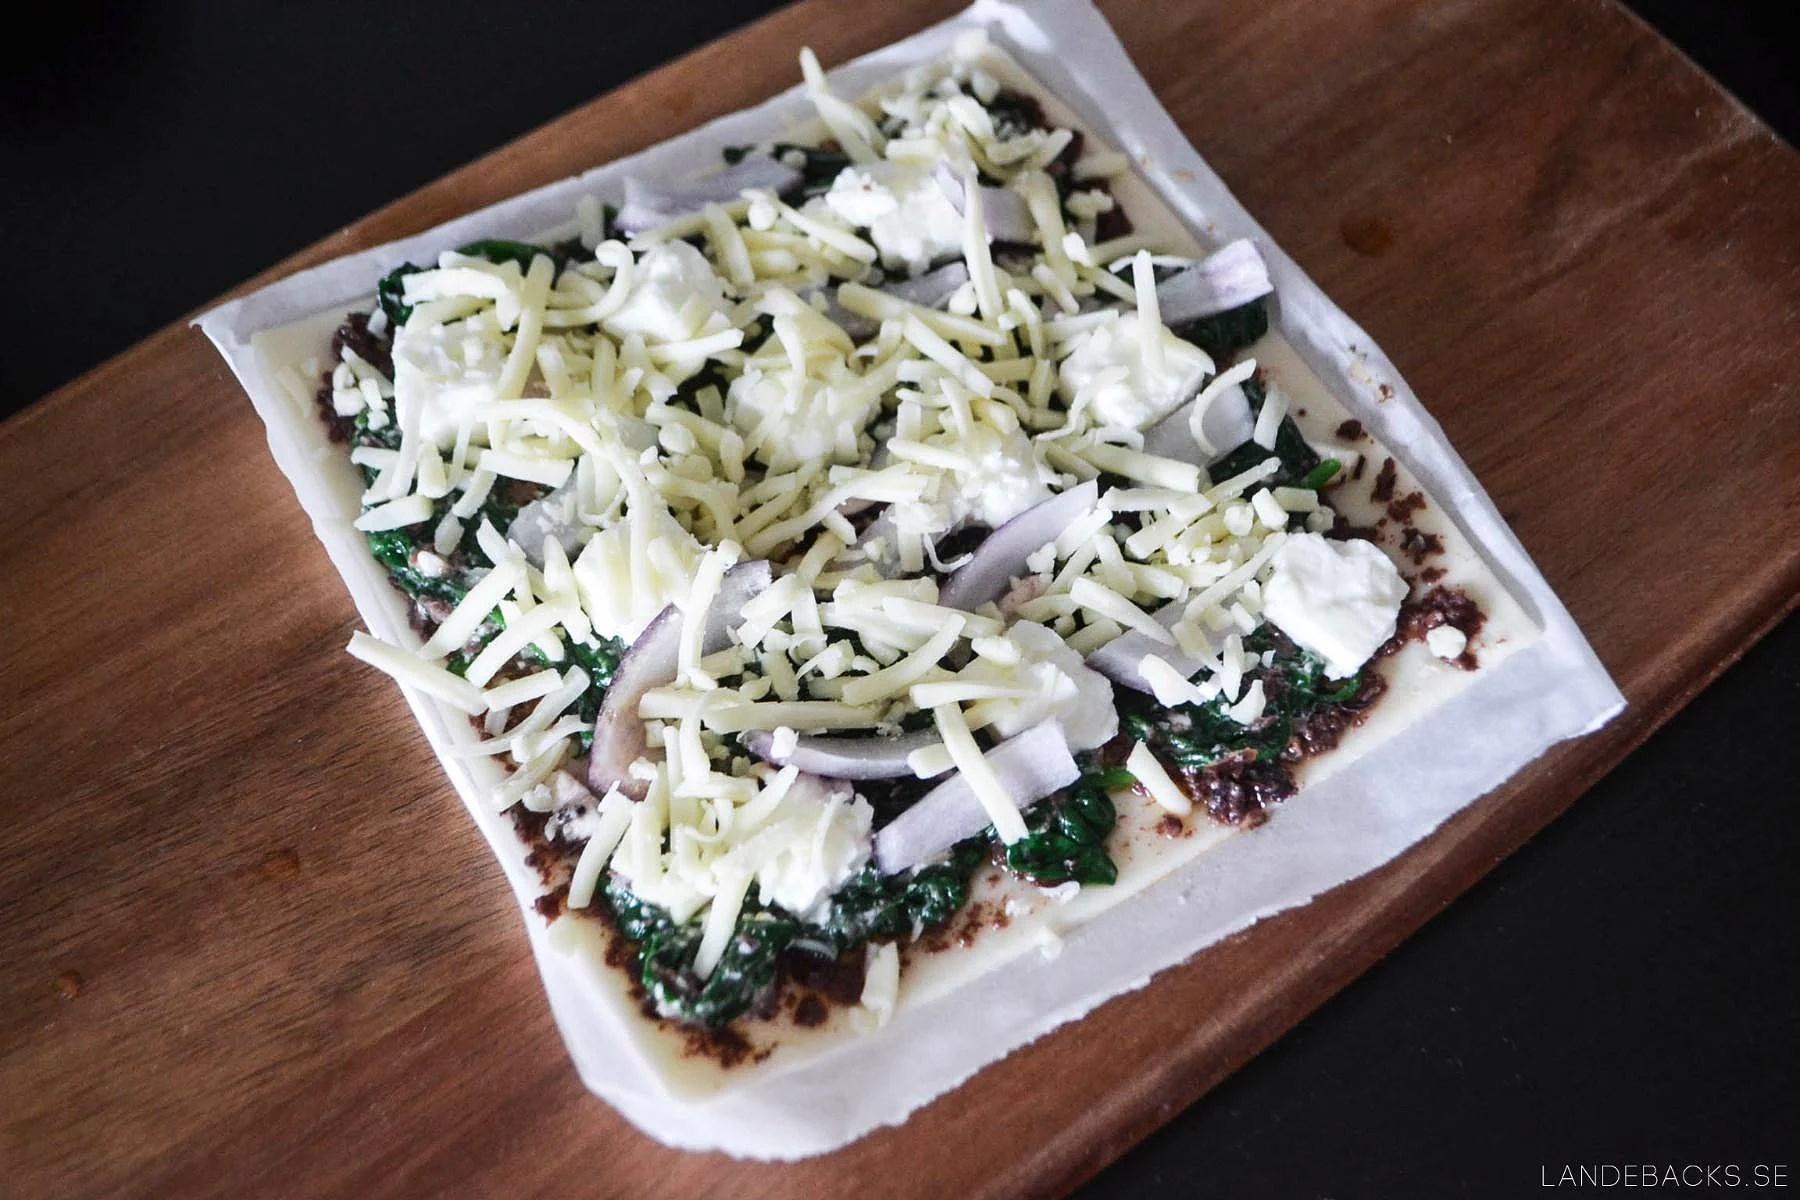 Spenat smördegspizza